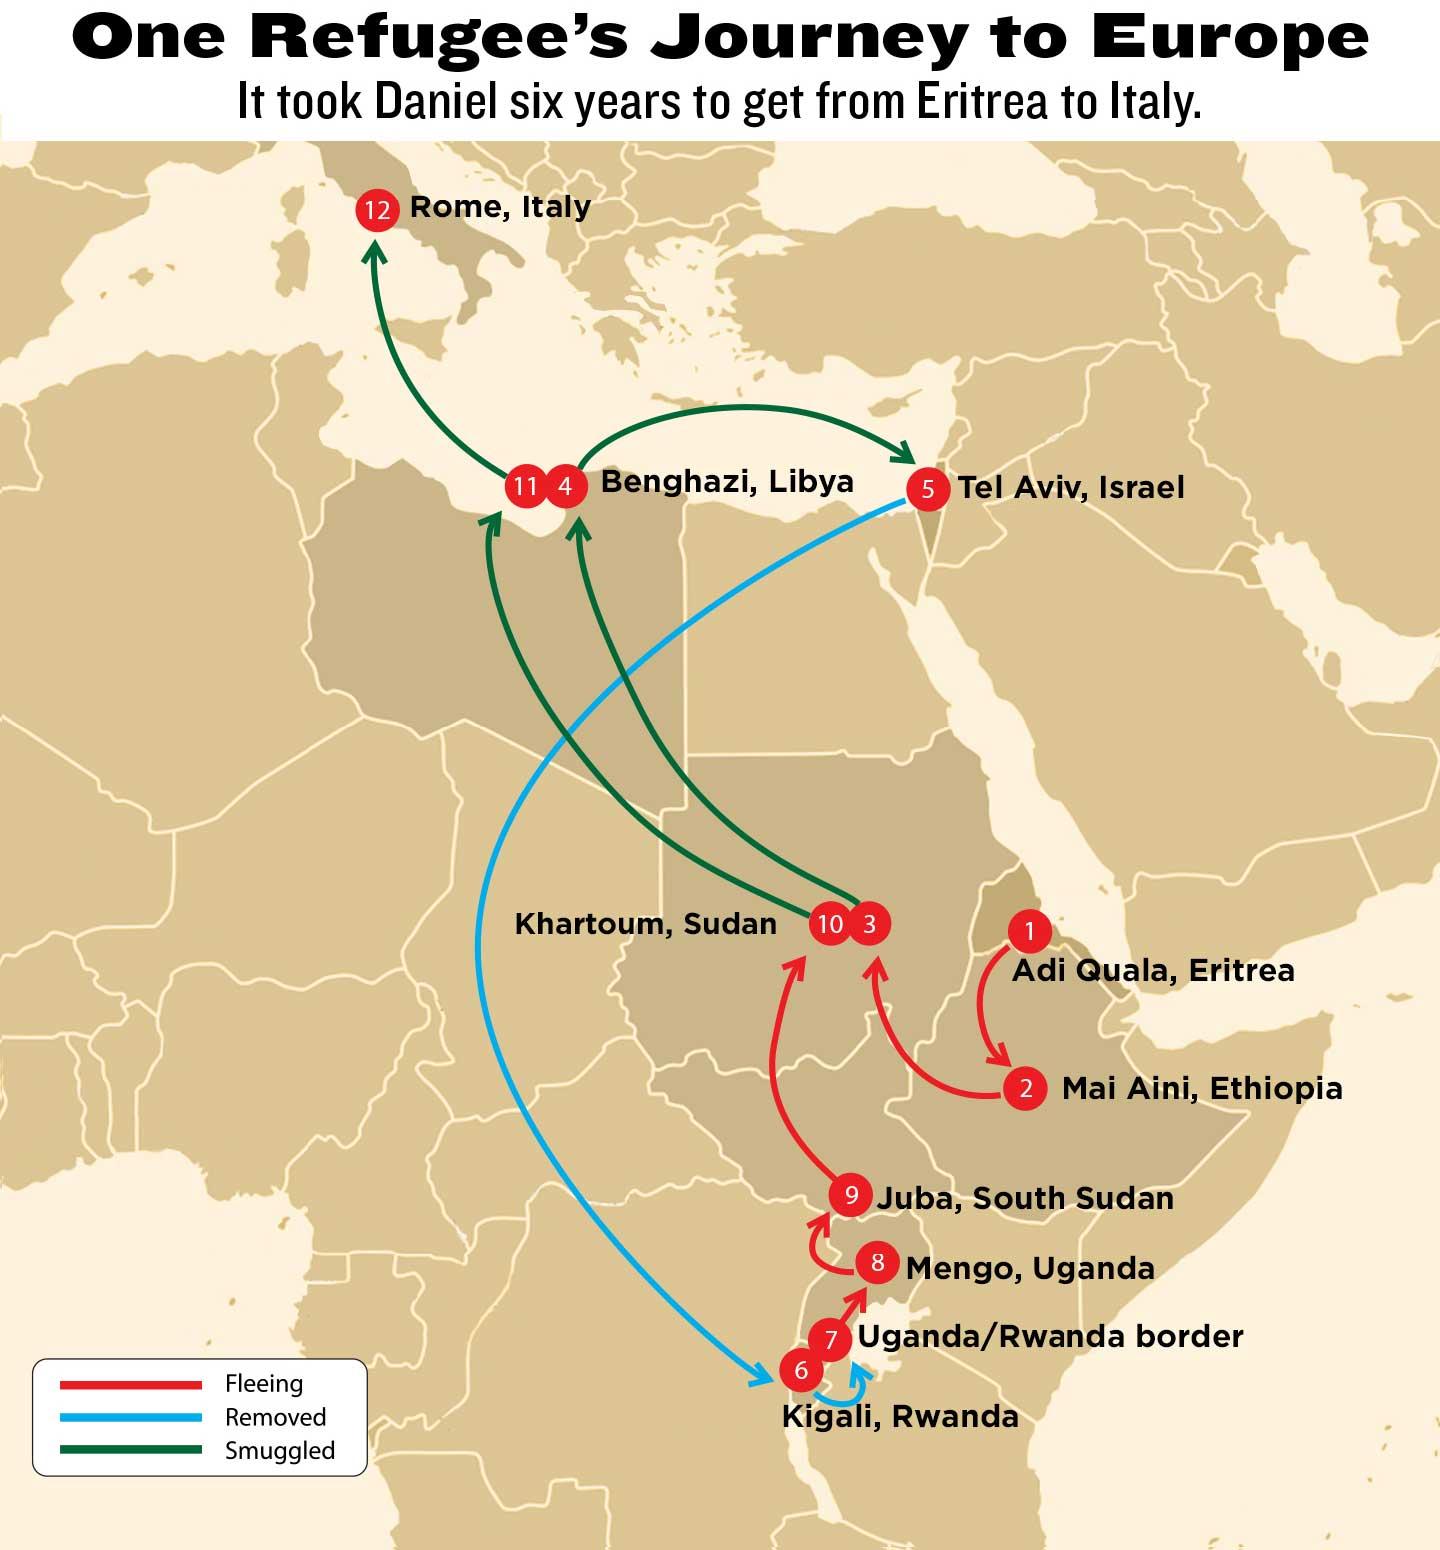 Sudan: Perilous Crossroads on Refugee Map on atlas mountains map, egypt and sudan map, nile sudan map, damascus syria map, casablanca morocco map, accra ghana map, zambezi river africa map, south sudan region map, south sudan natural resources map, tehran map, istanbul turkey map, tripoli libya map, tel aviv map, dongola sudan map, nairobi map, riyadh map, nile river map, s. sudan map, mogadishu somalia map,